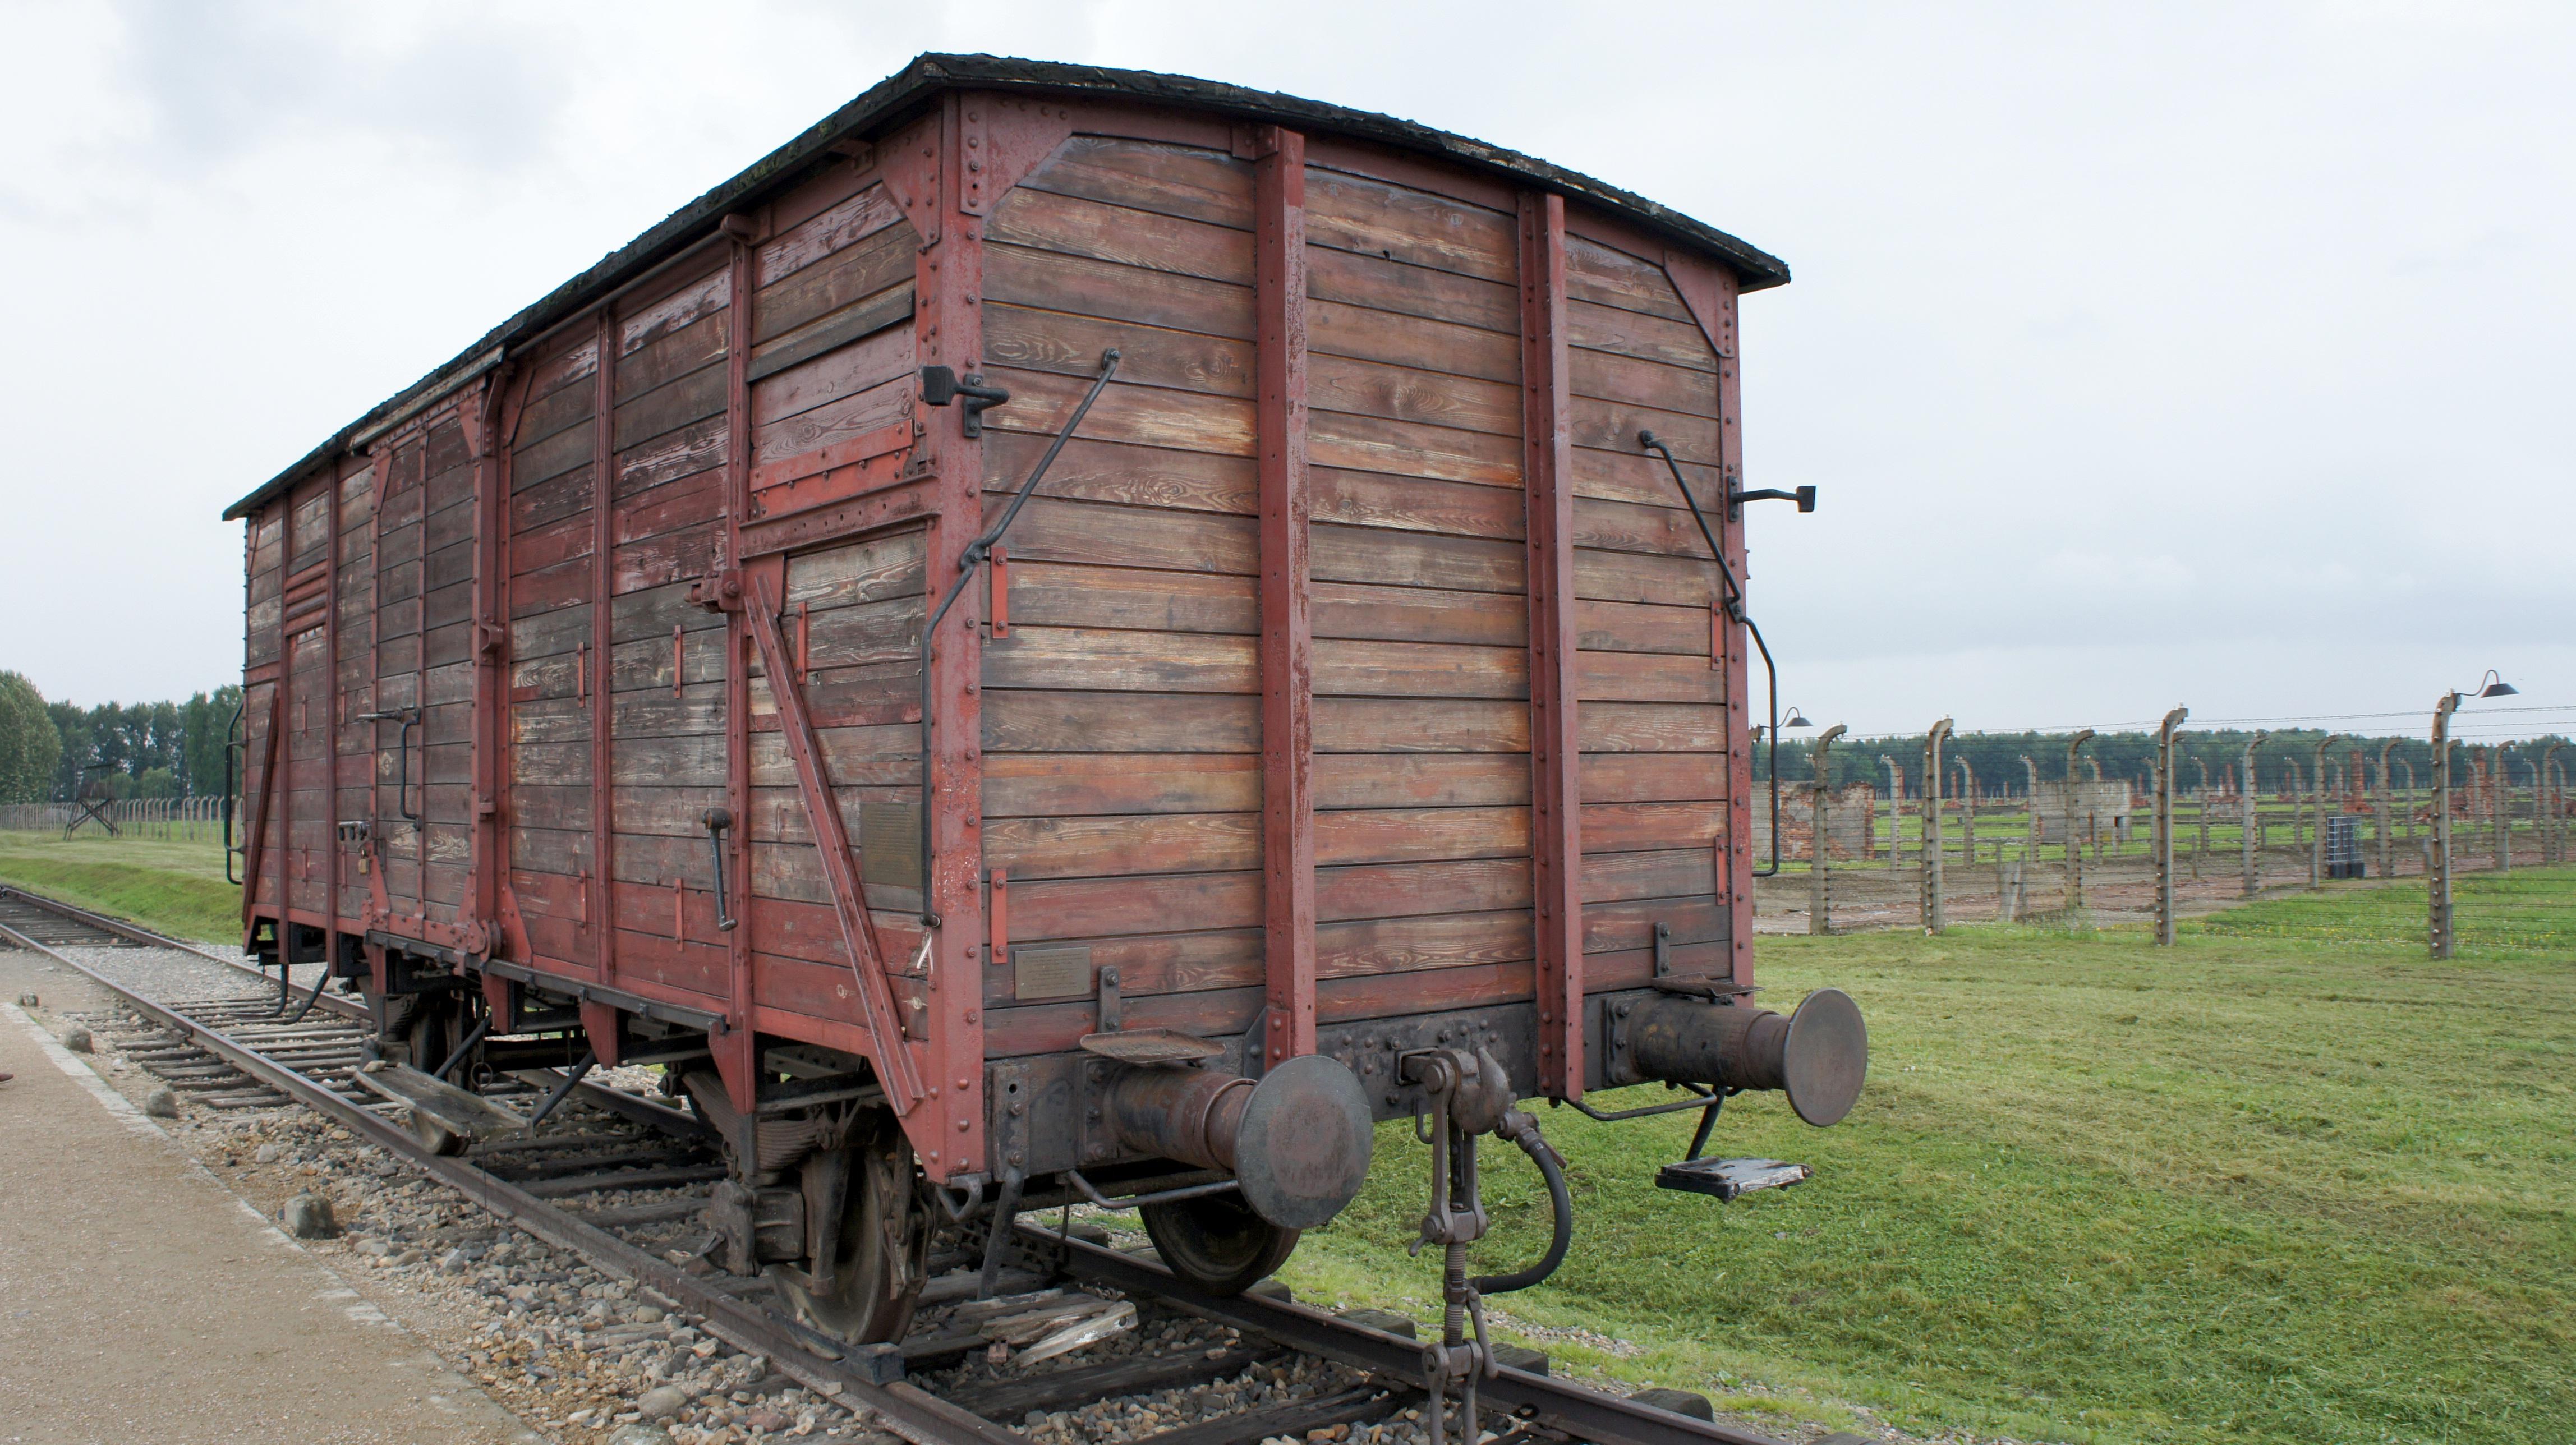 images gratuites ferme train v hicule guerre locomotive auschwitz transport ferroviaire. Black Bedroom Furniture Sets. Home Design Ideas